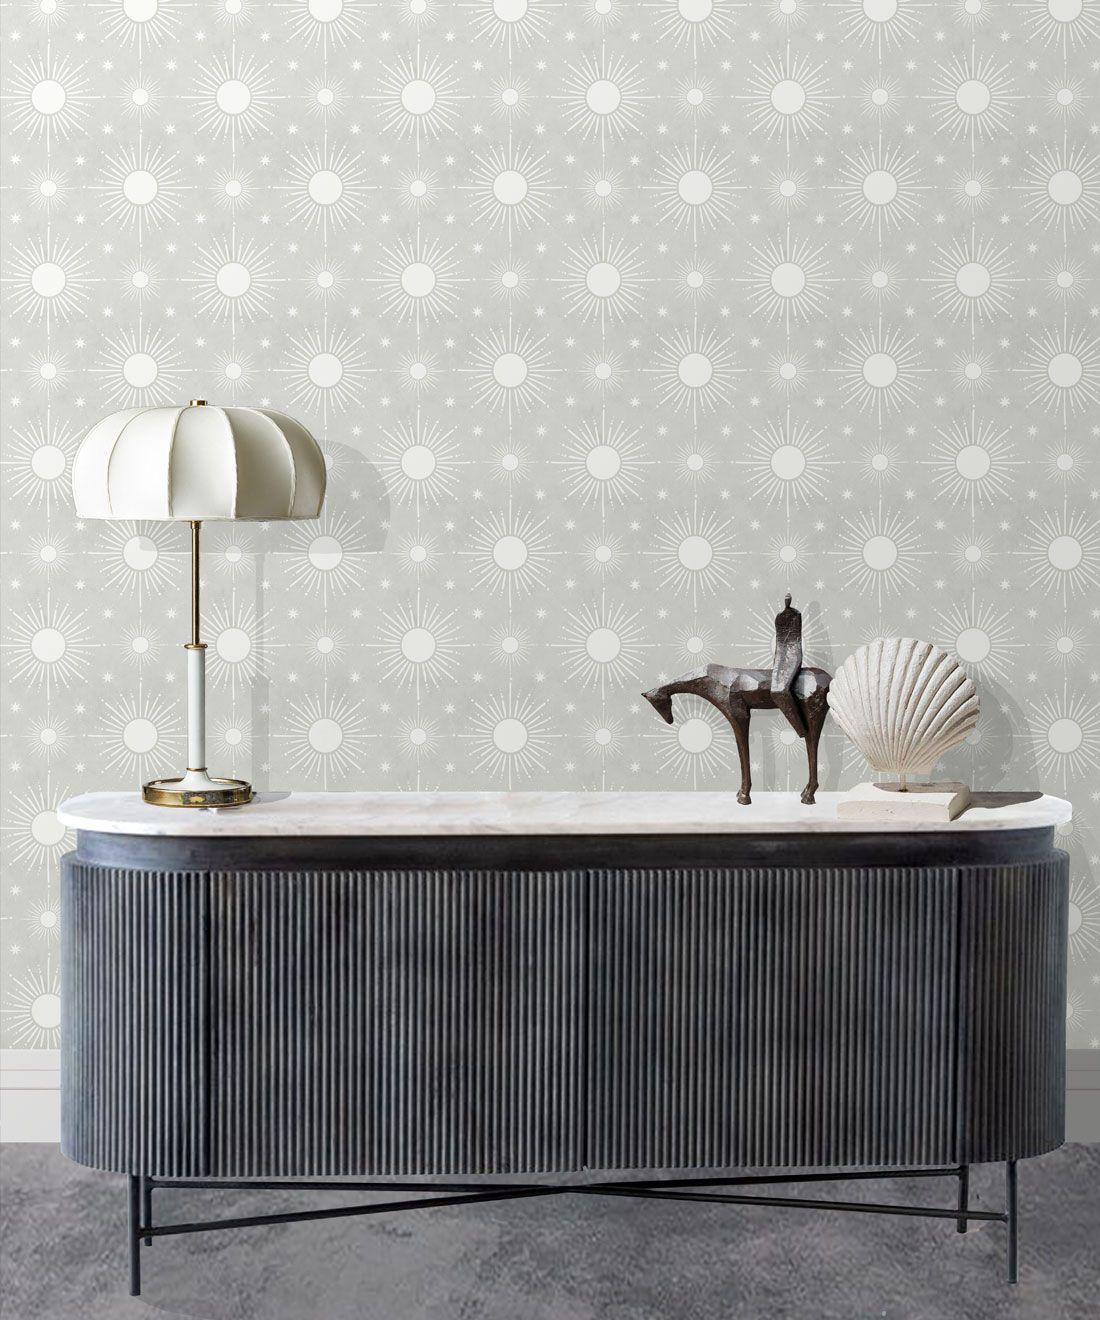 Sun Light Star Bright Wallpaper • Beige • Insitu